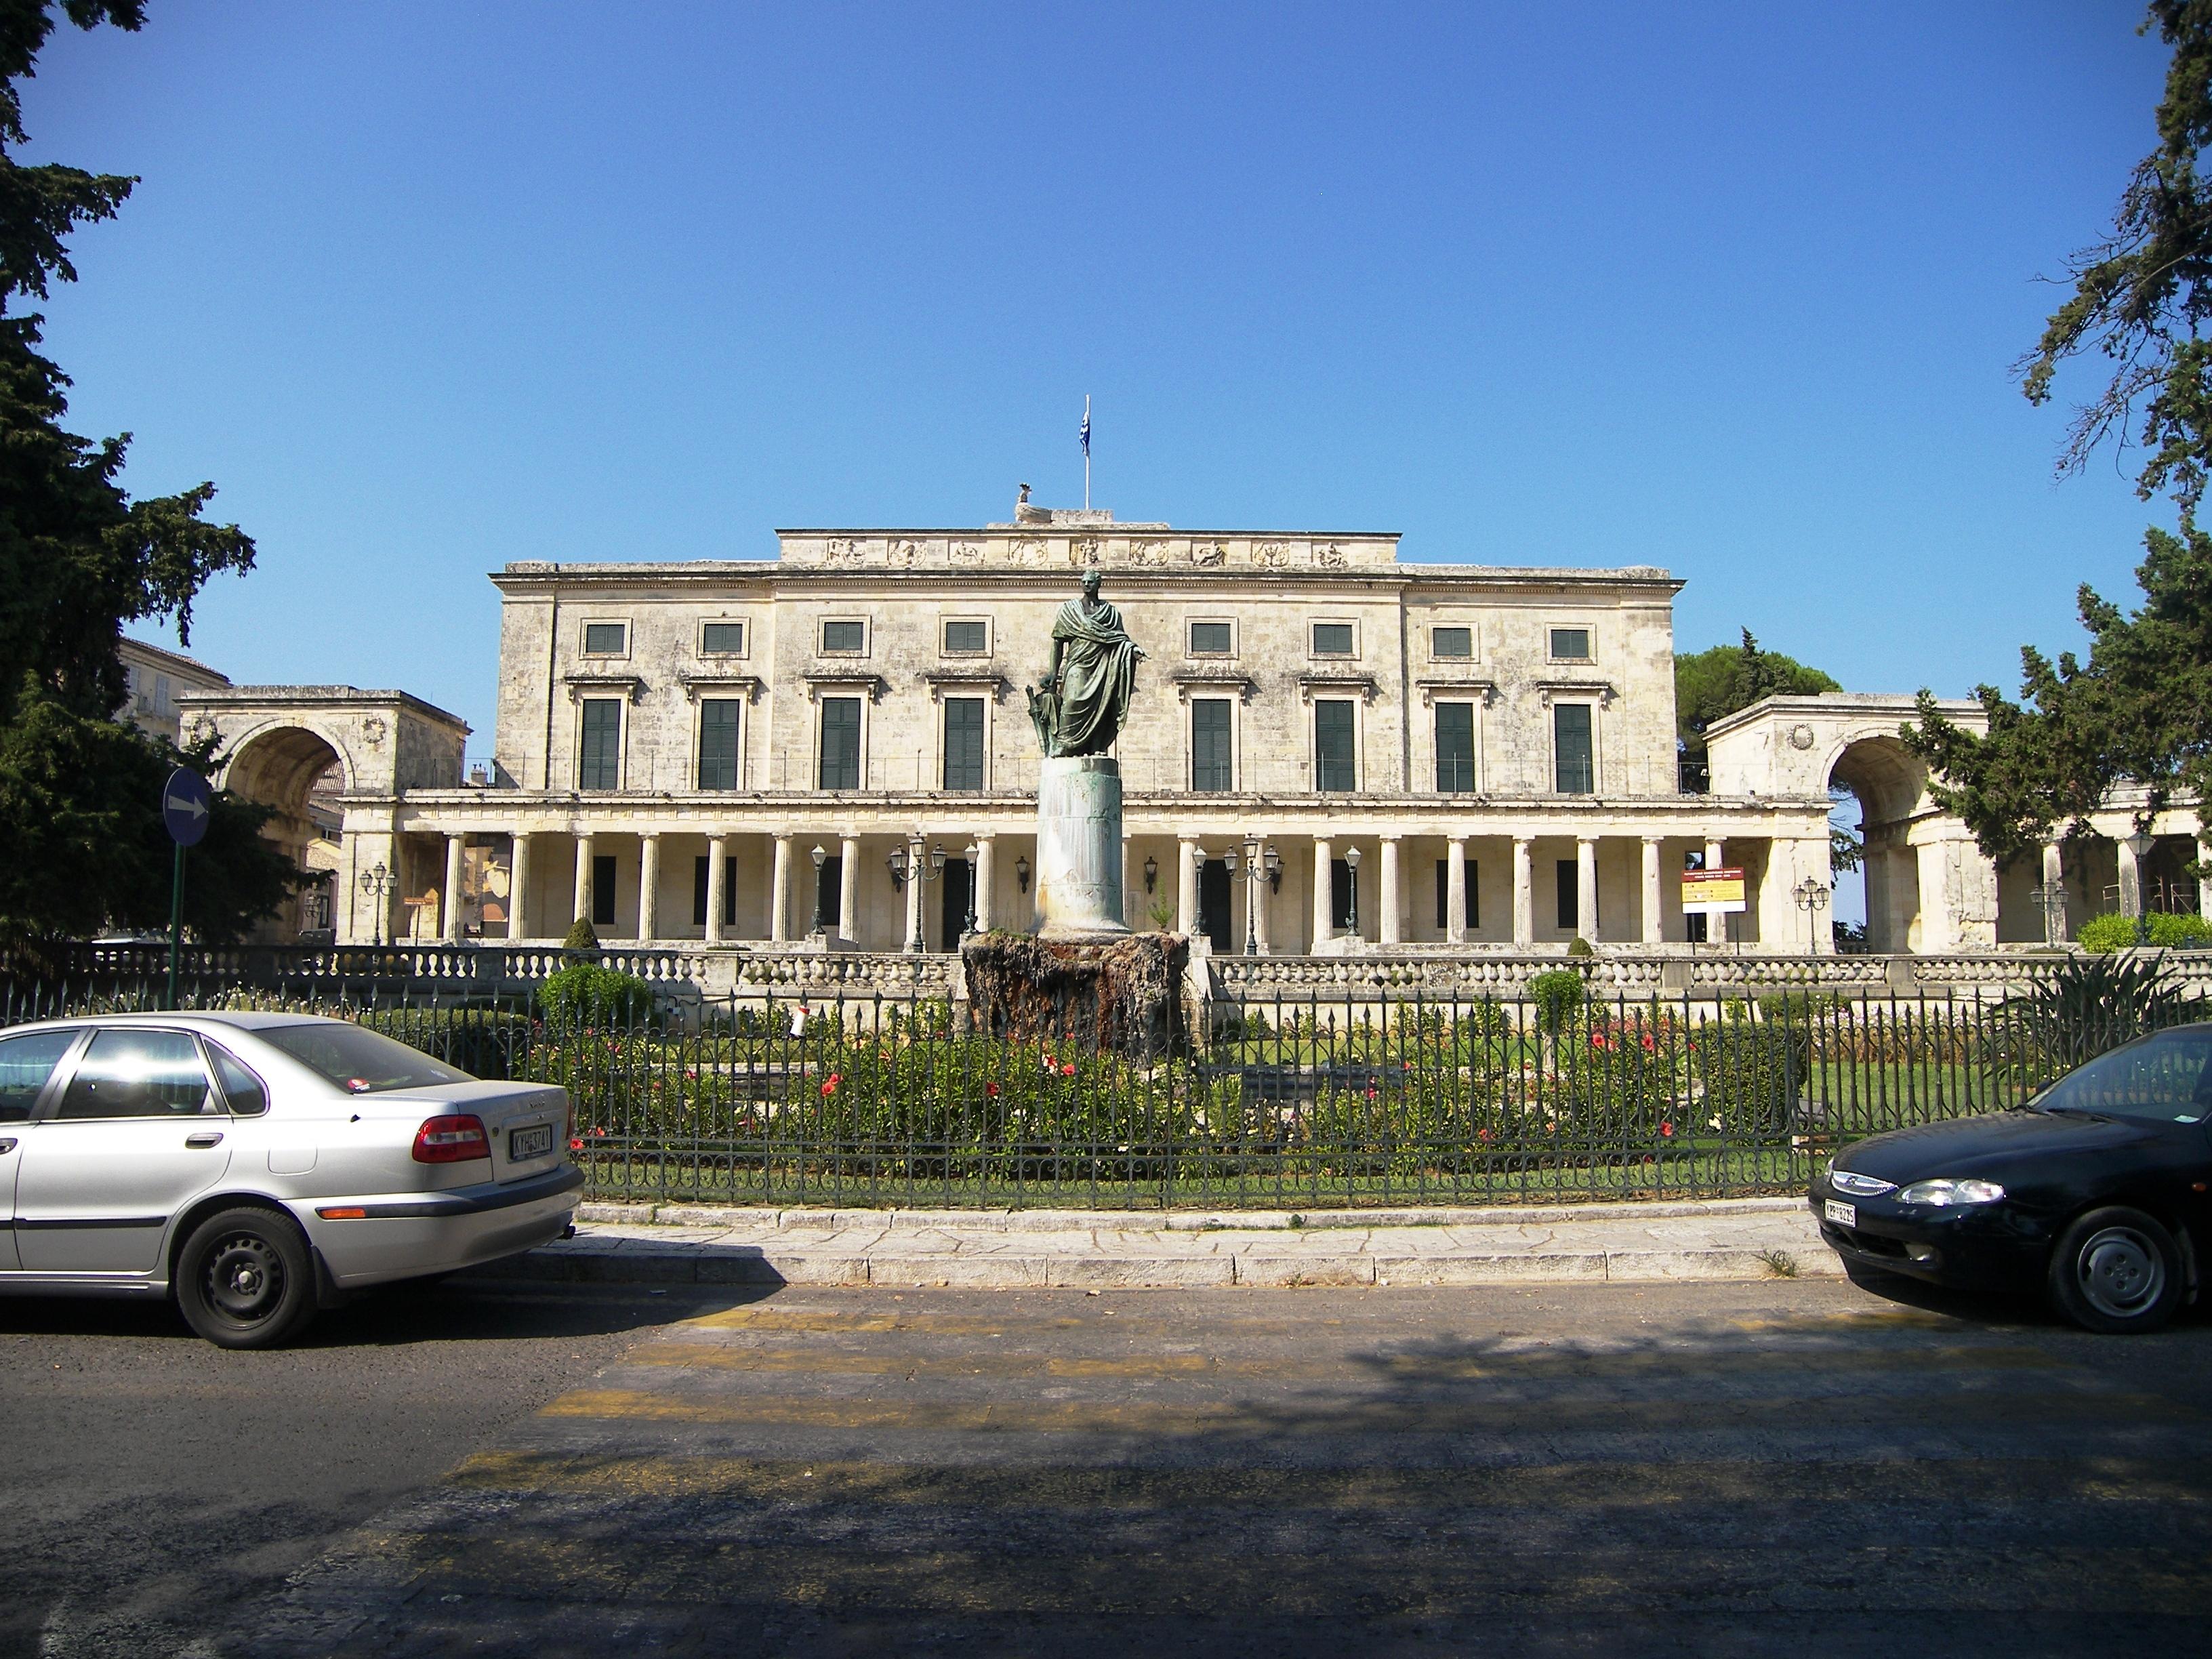 File:Palaia Anaktora in Kerkyra.jpg - Wikimedia Commons